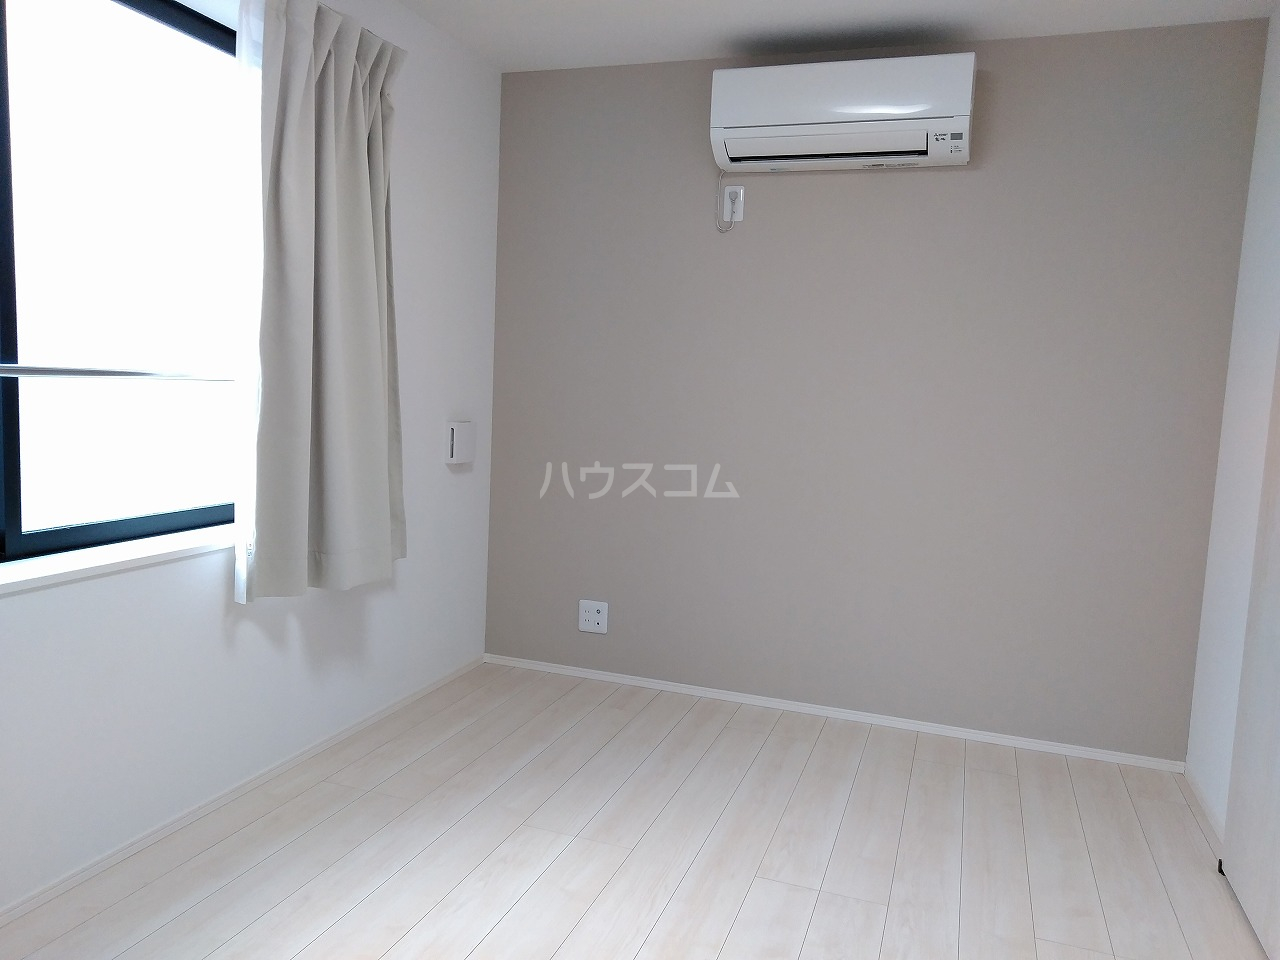 J・スタイリオ堀切 304号室の居室